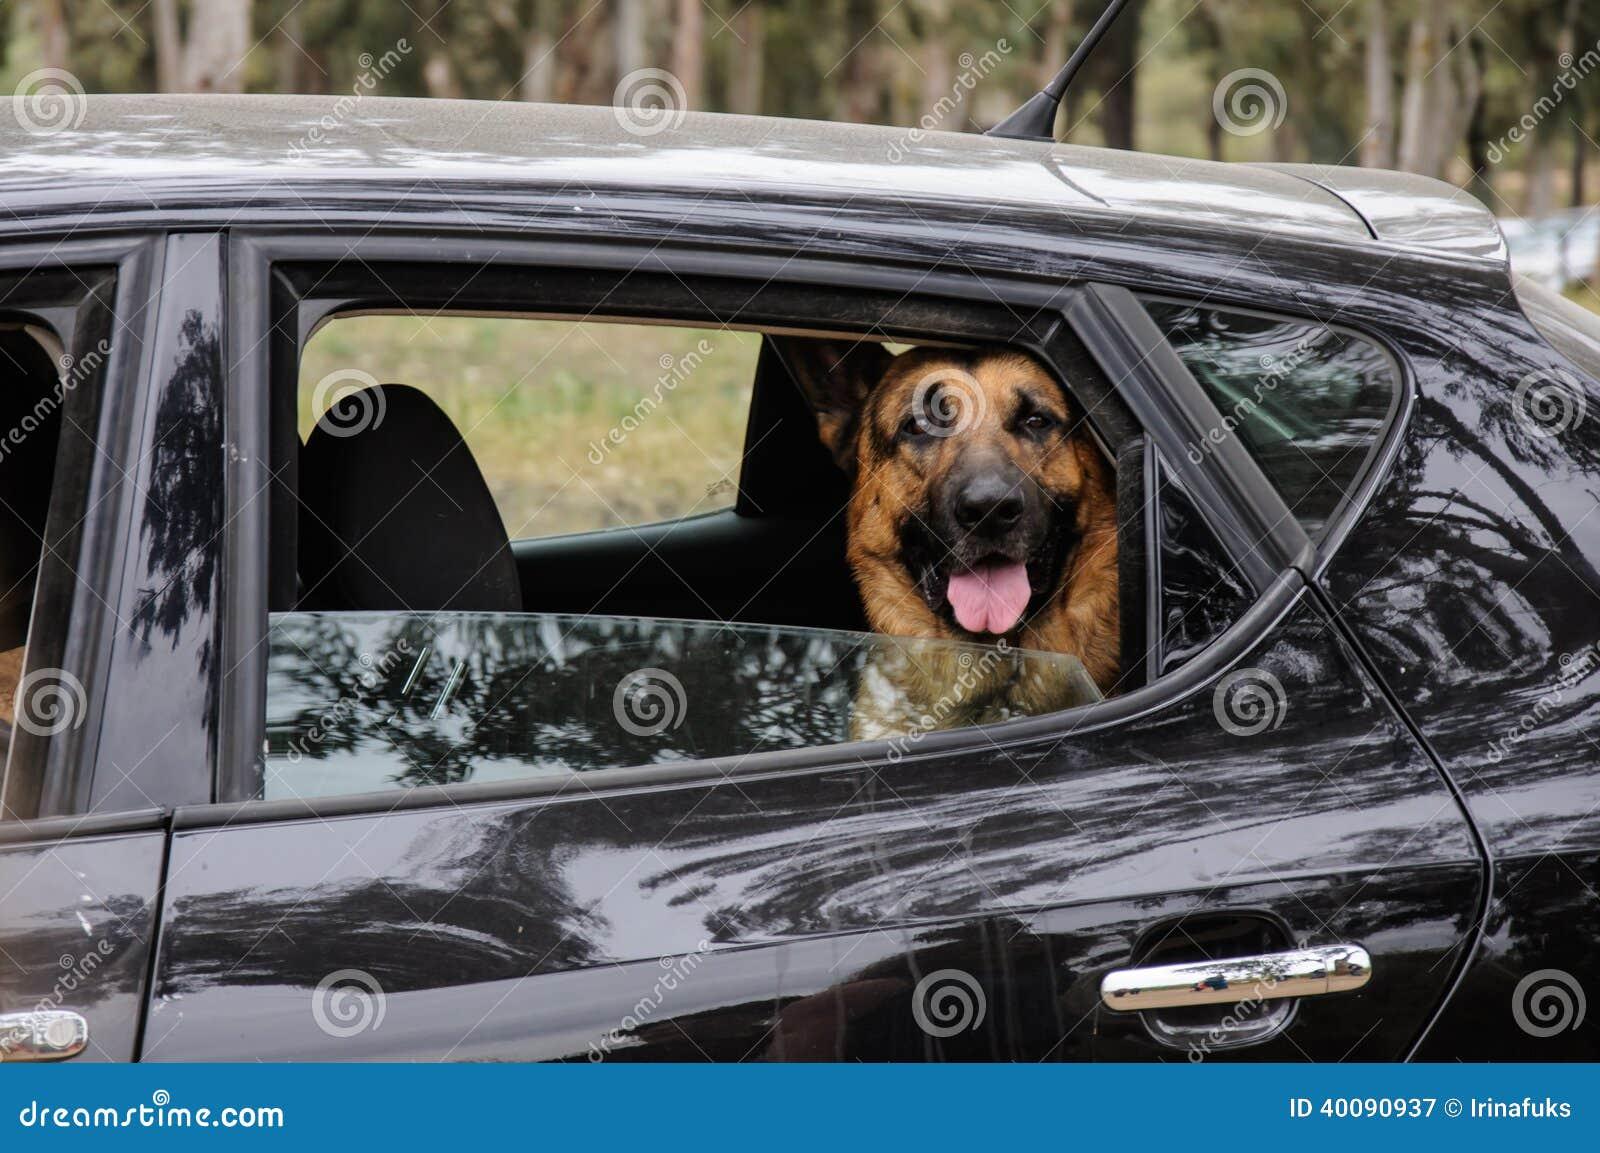 German Shepherd Dog Looking Out Of A Motor Car Window